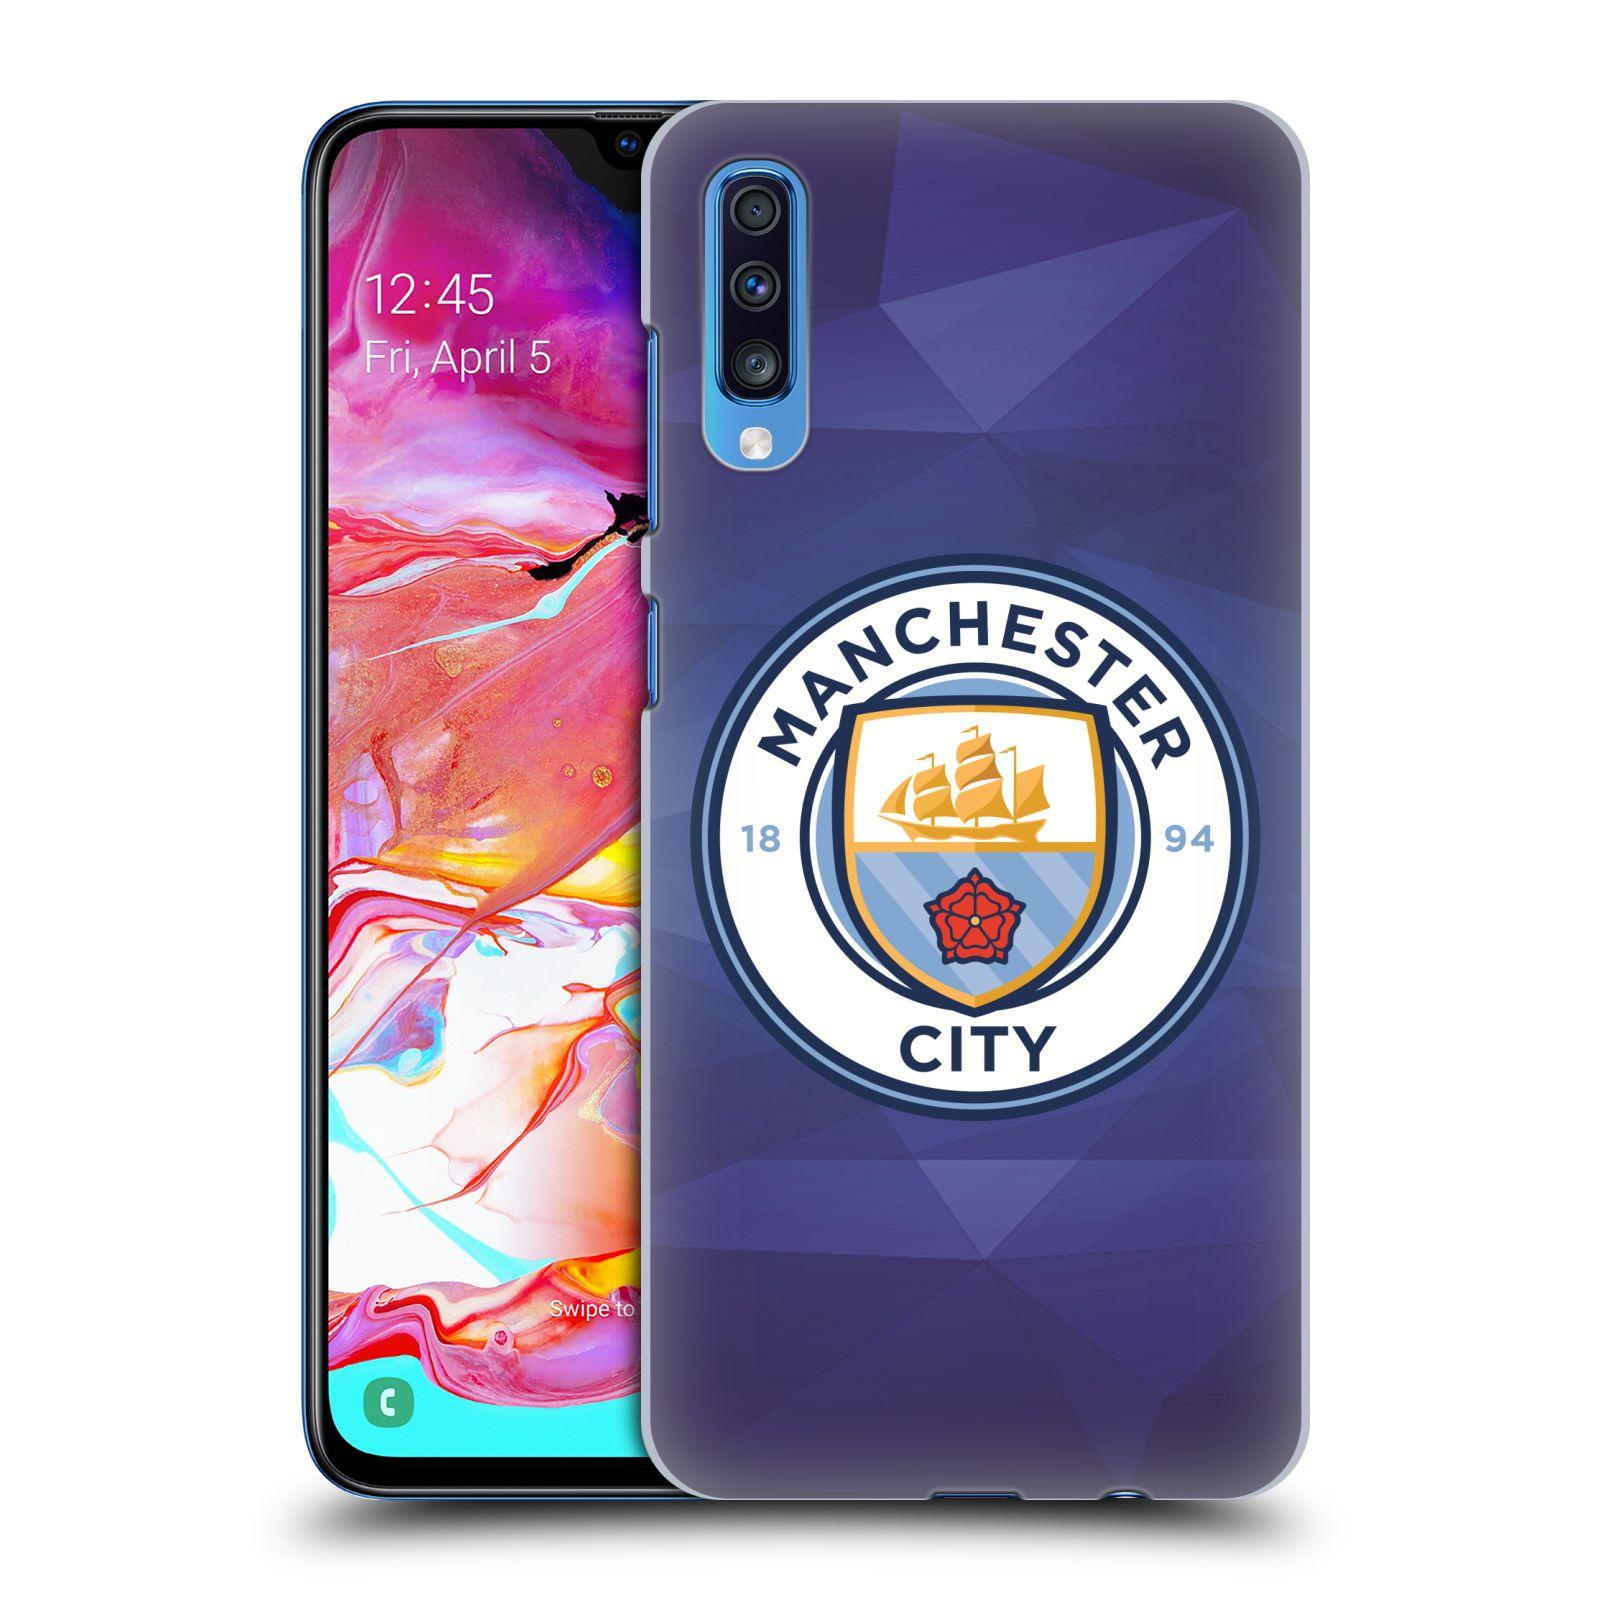 Plastové pouzdro na mobil Samsung Galaxy A70 - Head Case - Manchester City FC - Modré nové logo